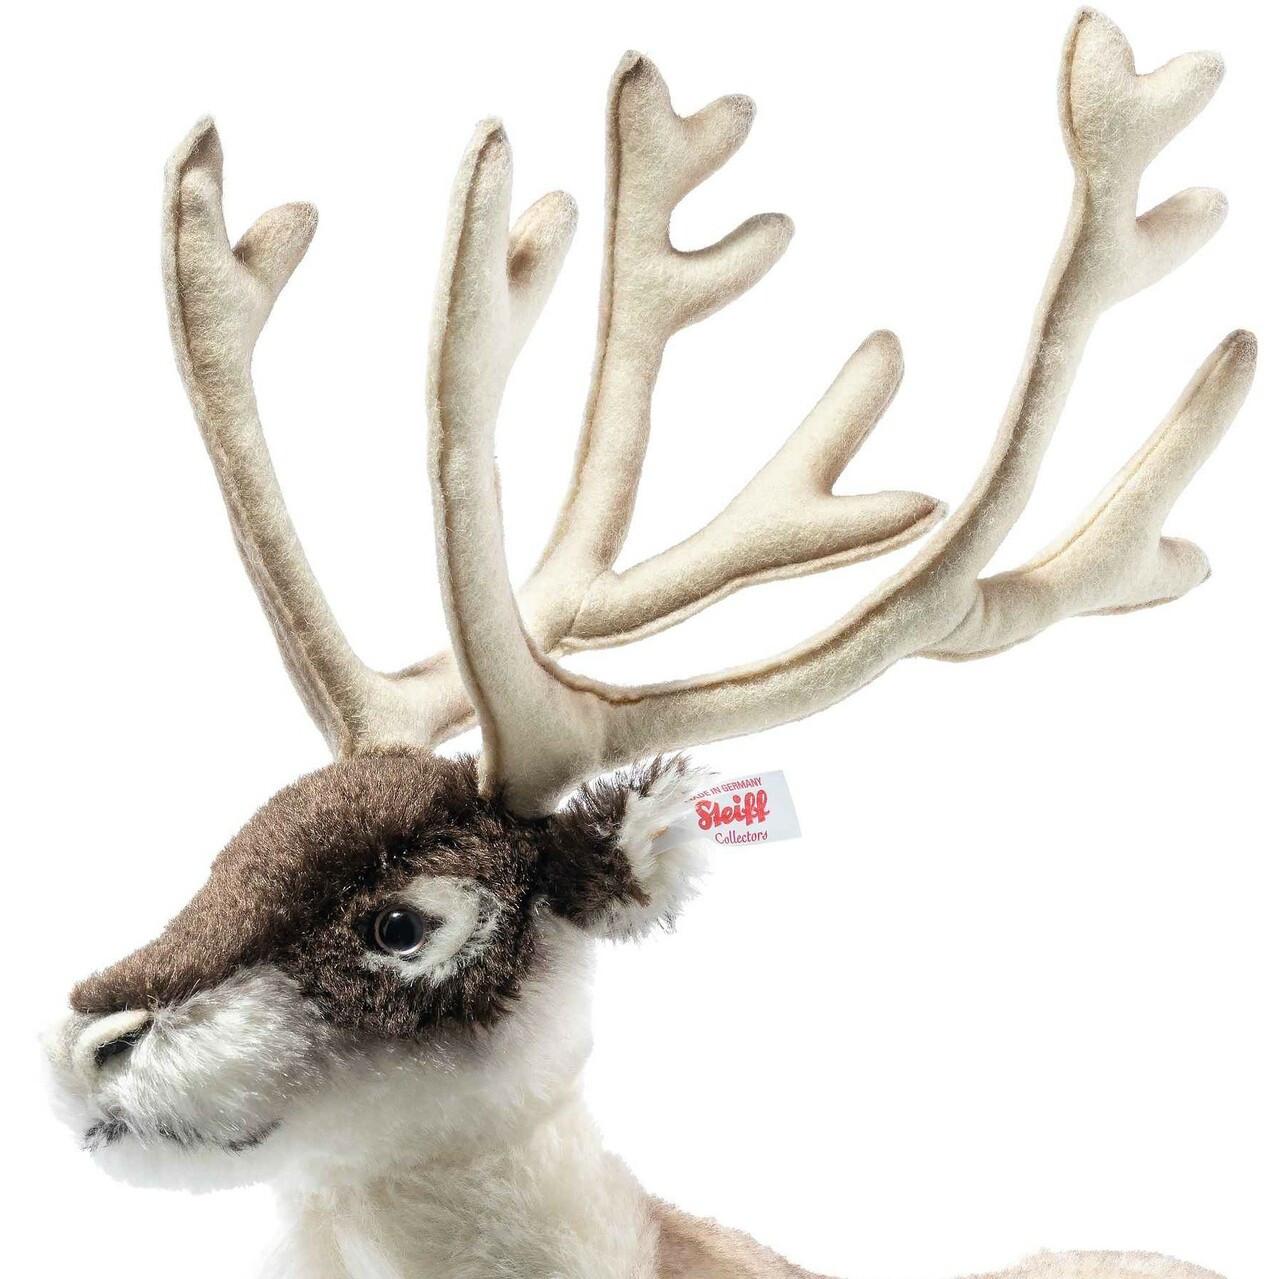 Erik Reindeer Steiff Limited Edition EAN 006074 face